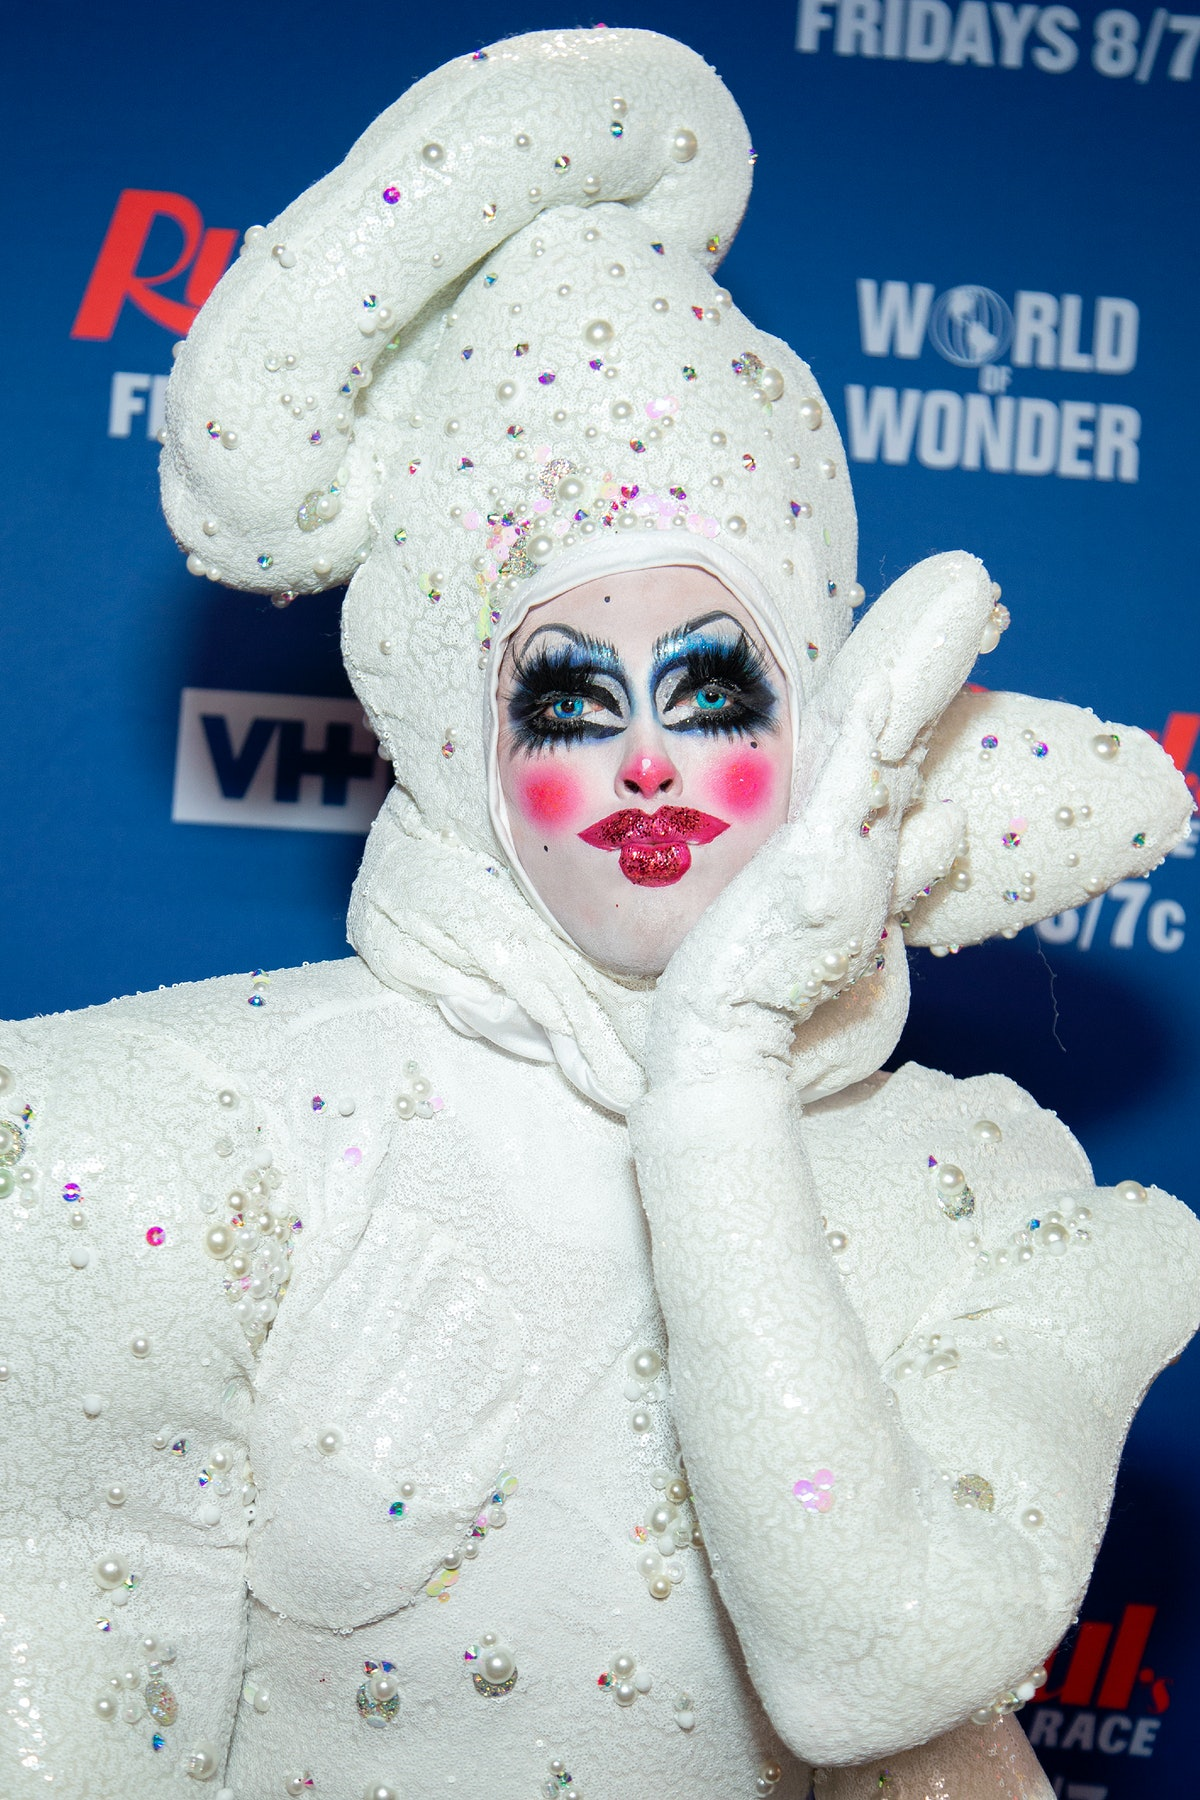 NEW YORK, NEW YORK - FEBRUARY 26: Crystal Methyd attends 'RuPaul's Drag Race Season 12' meet the que...